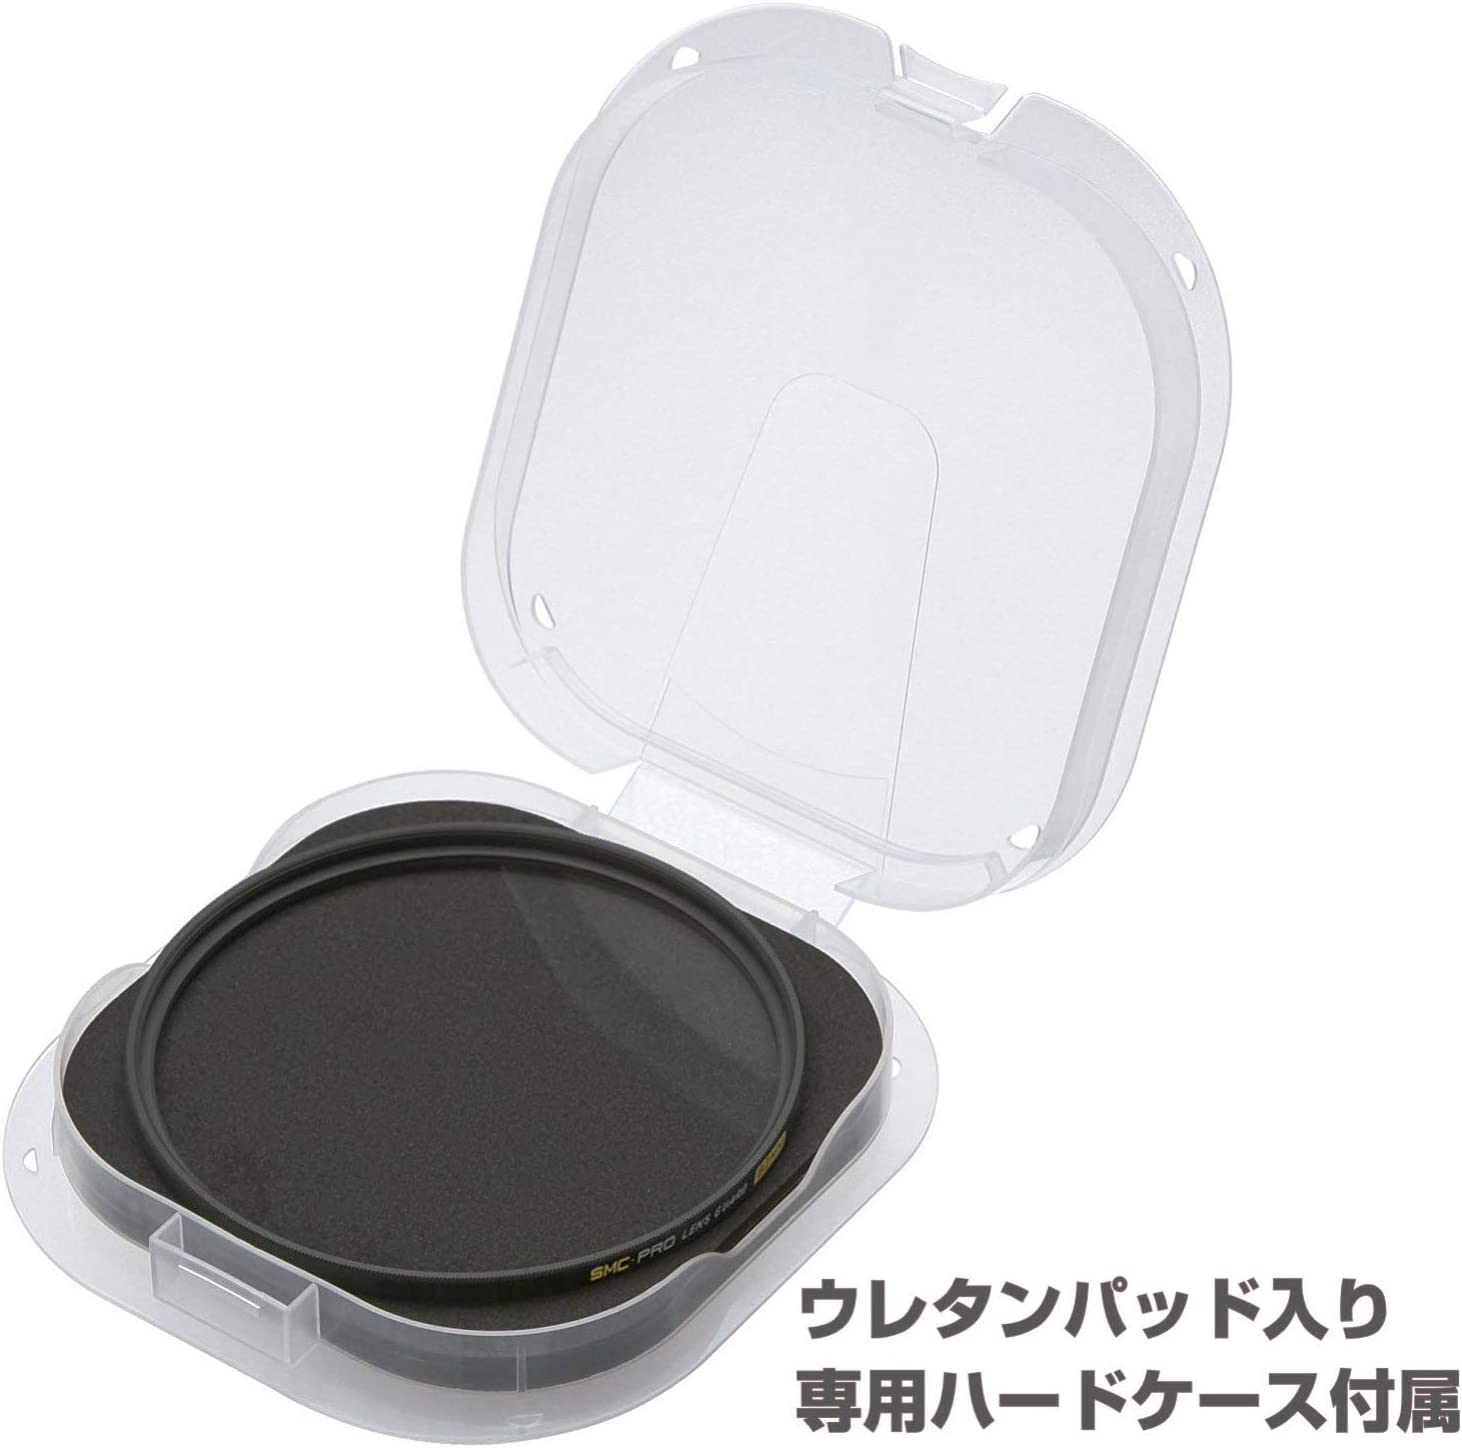 Hakuba 49mm Lens Filter SMC-PRO Lens Guard high Transmittance Thin Frame Made in Japan Protection for CF-SMCPRLG49